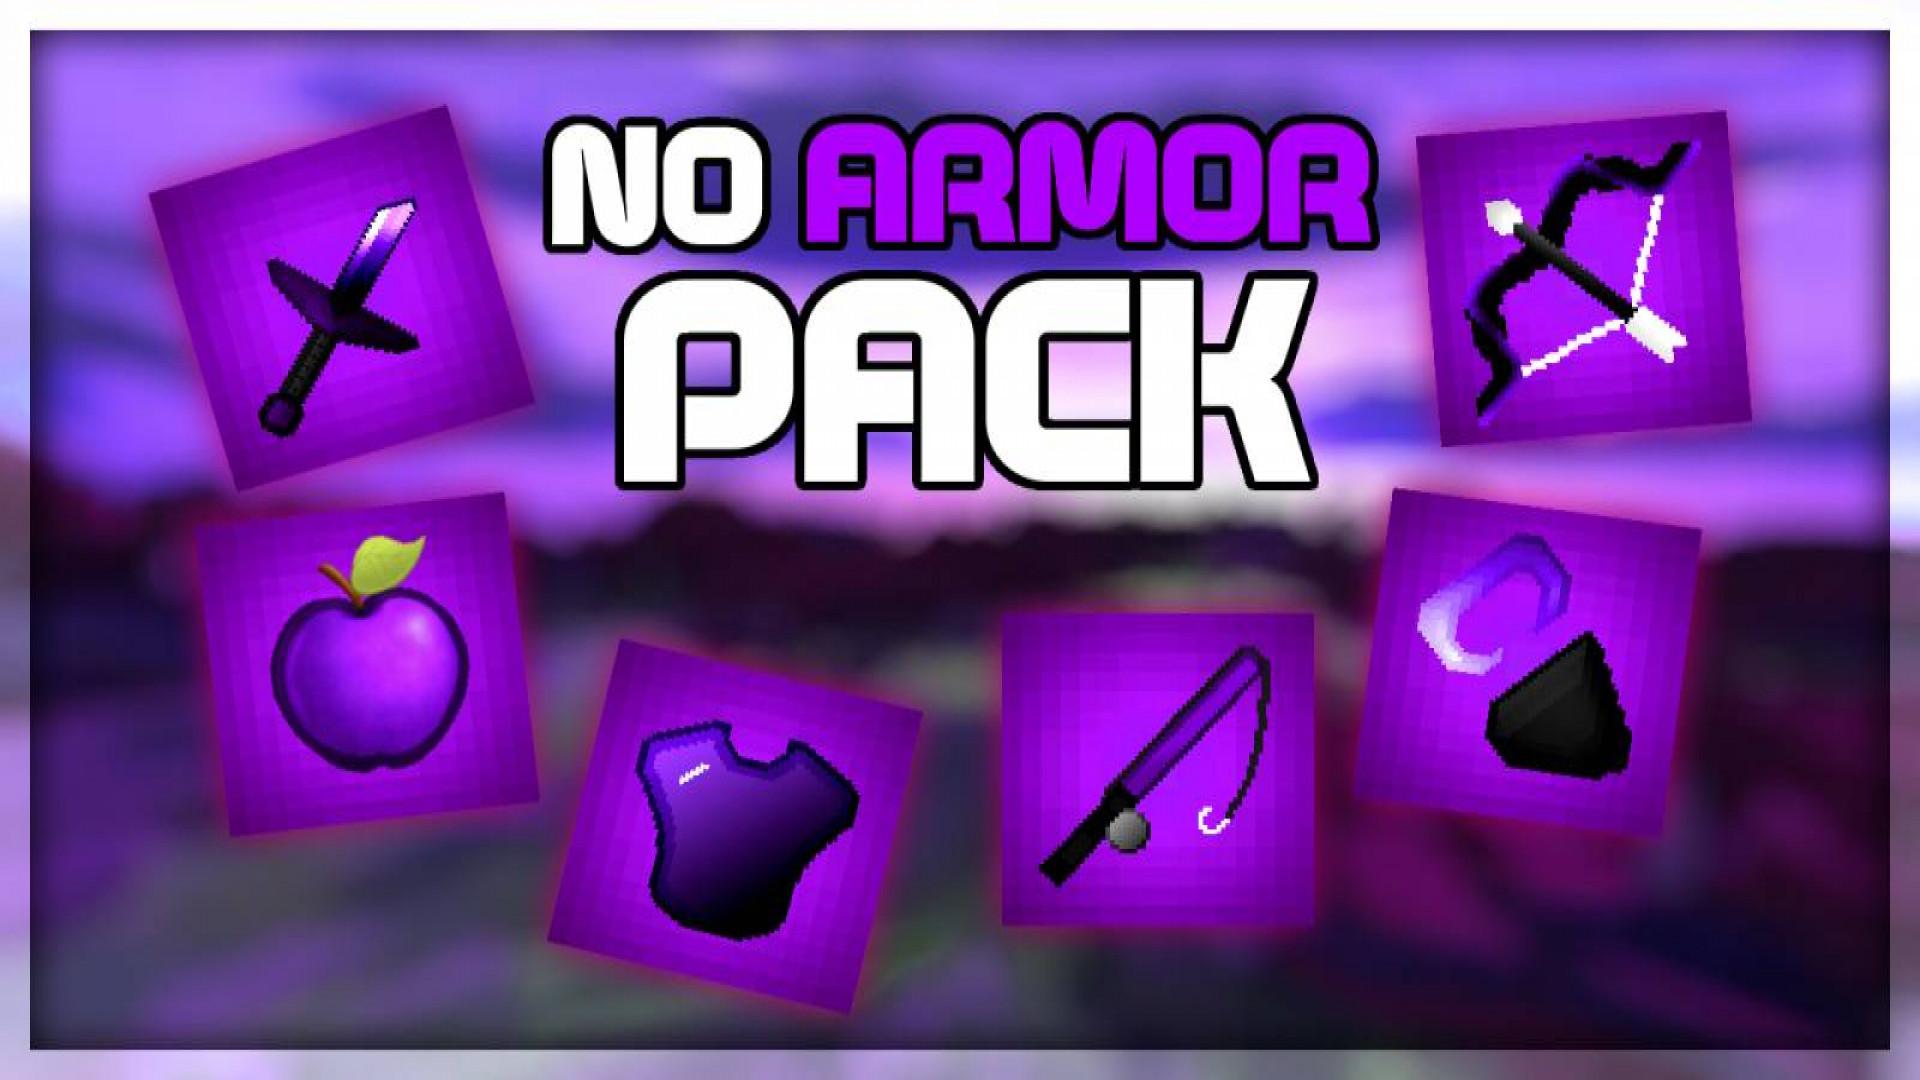 NoArmor Pack